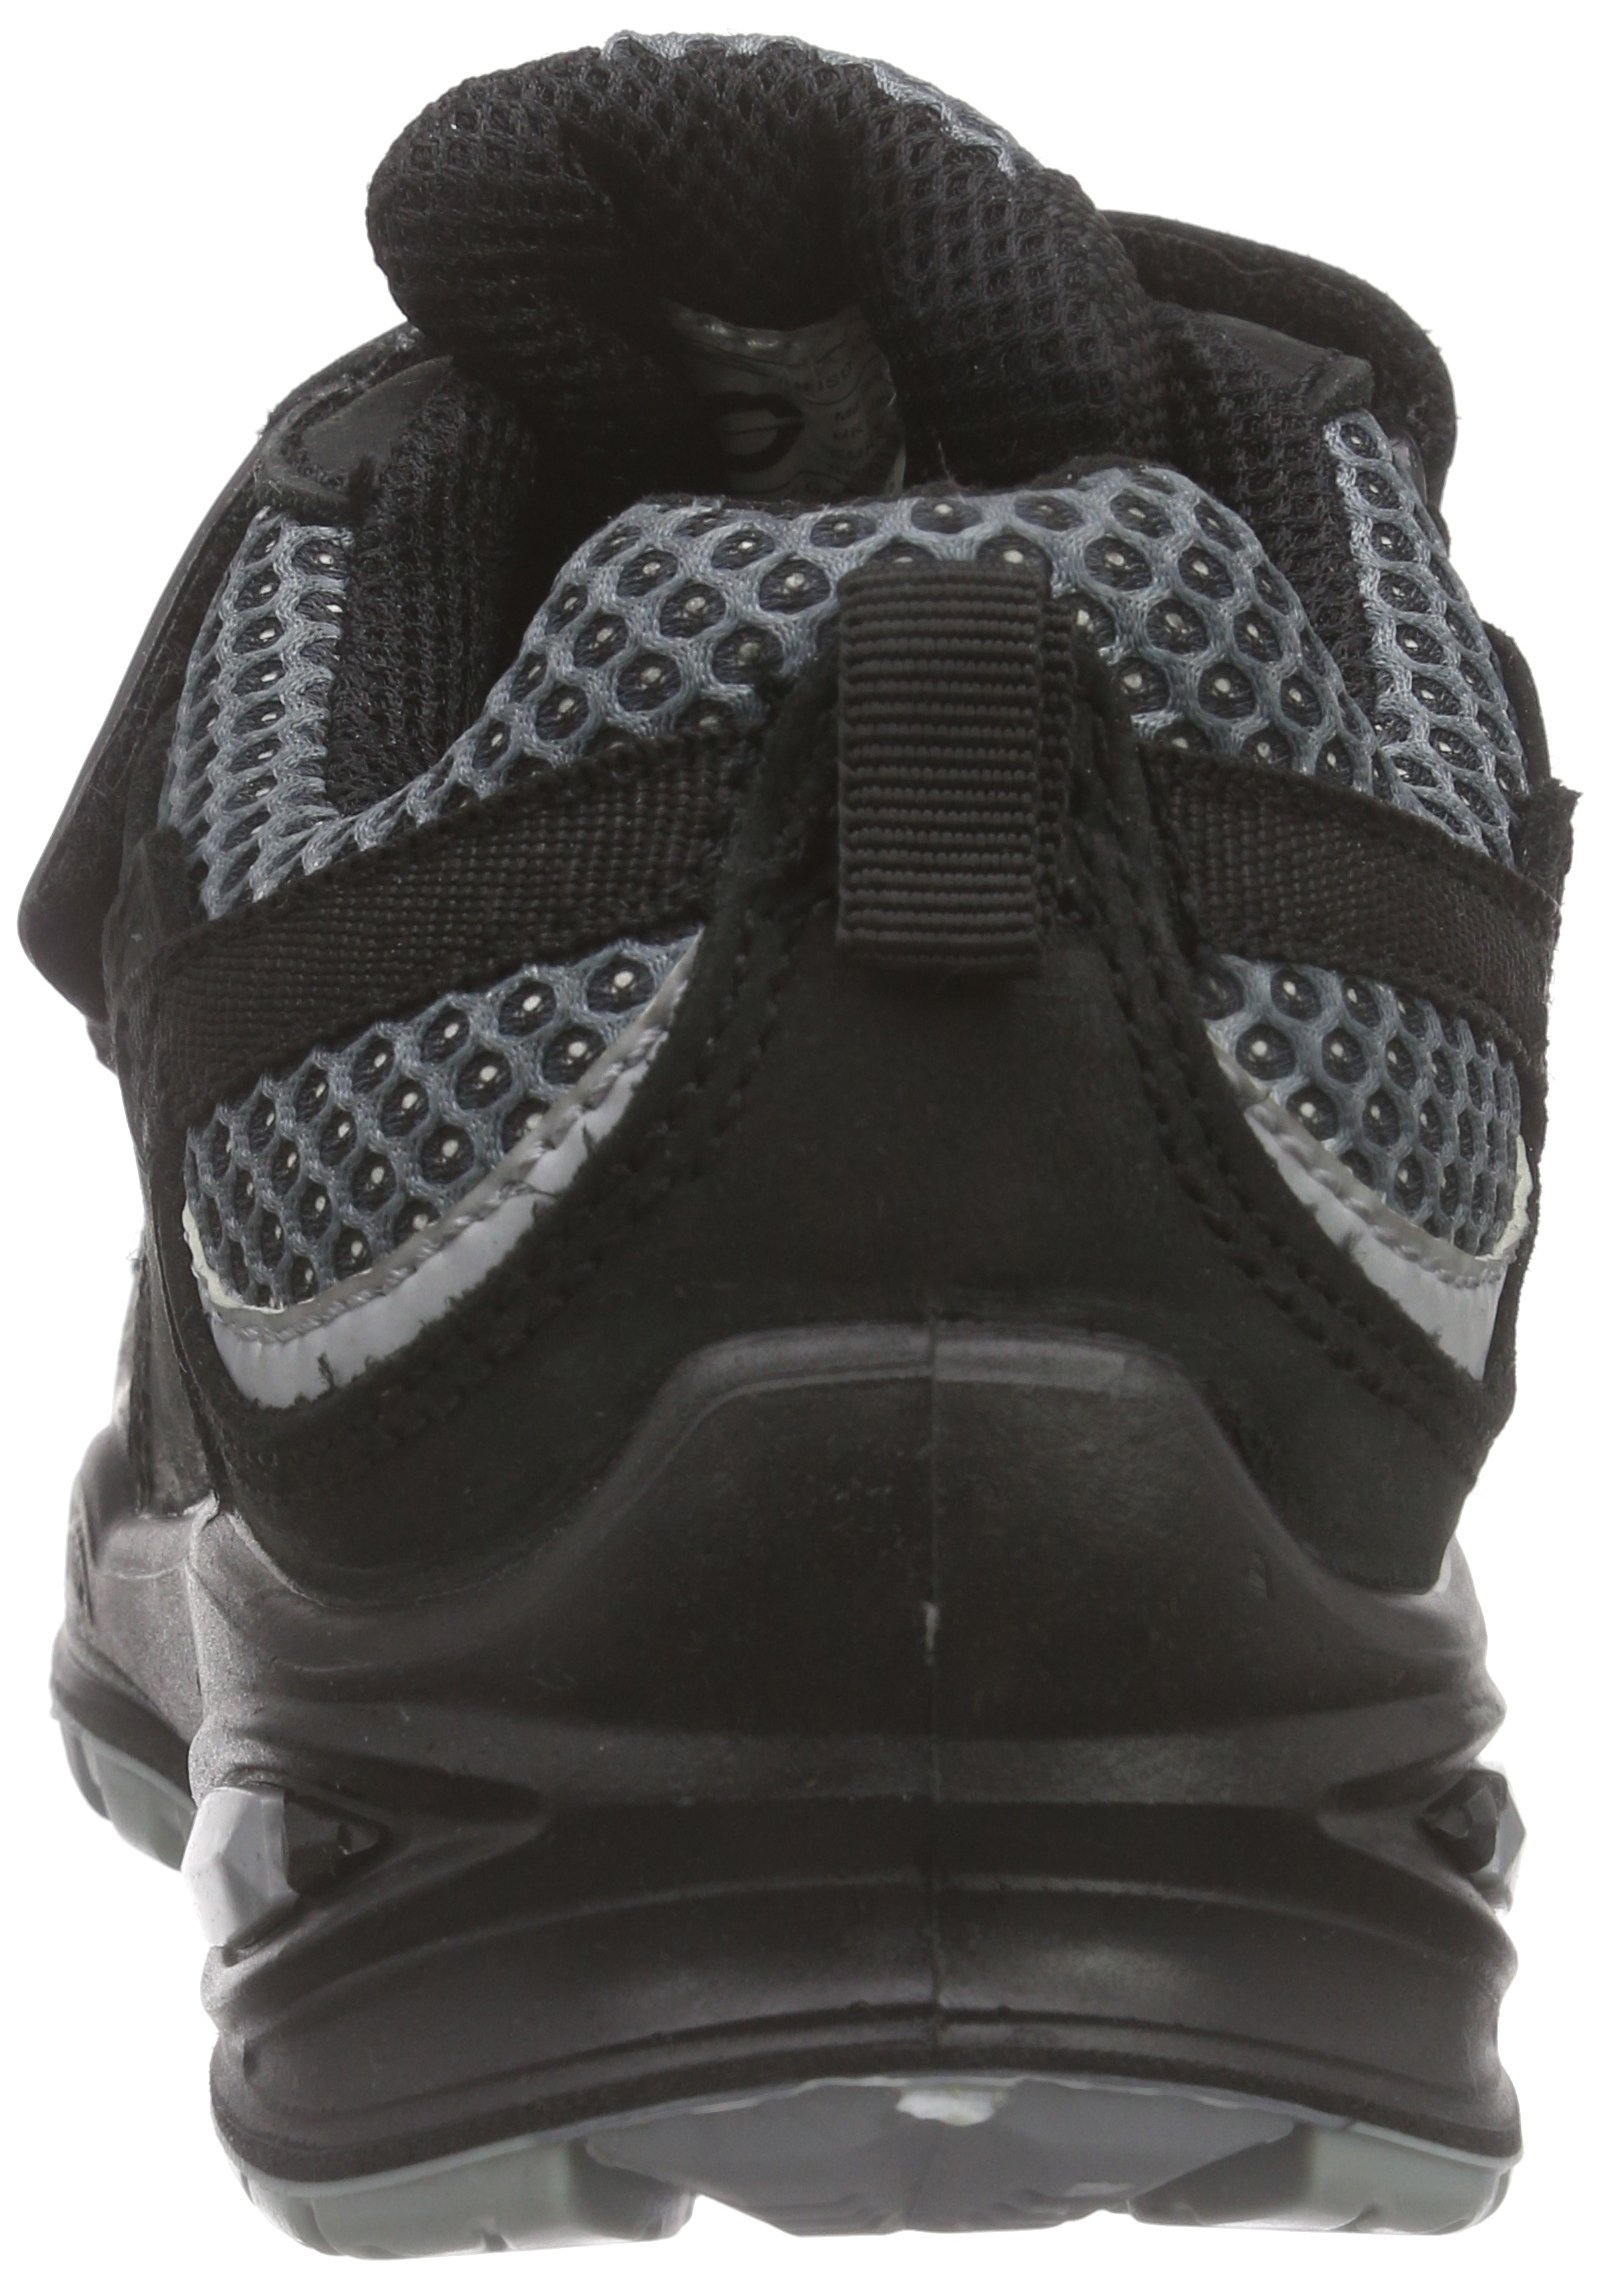 Sanita Unisex Millstone-ESD-s3 Velcro Leather Shoe Sicherheitsschuhe